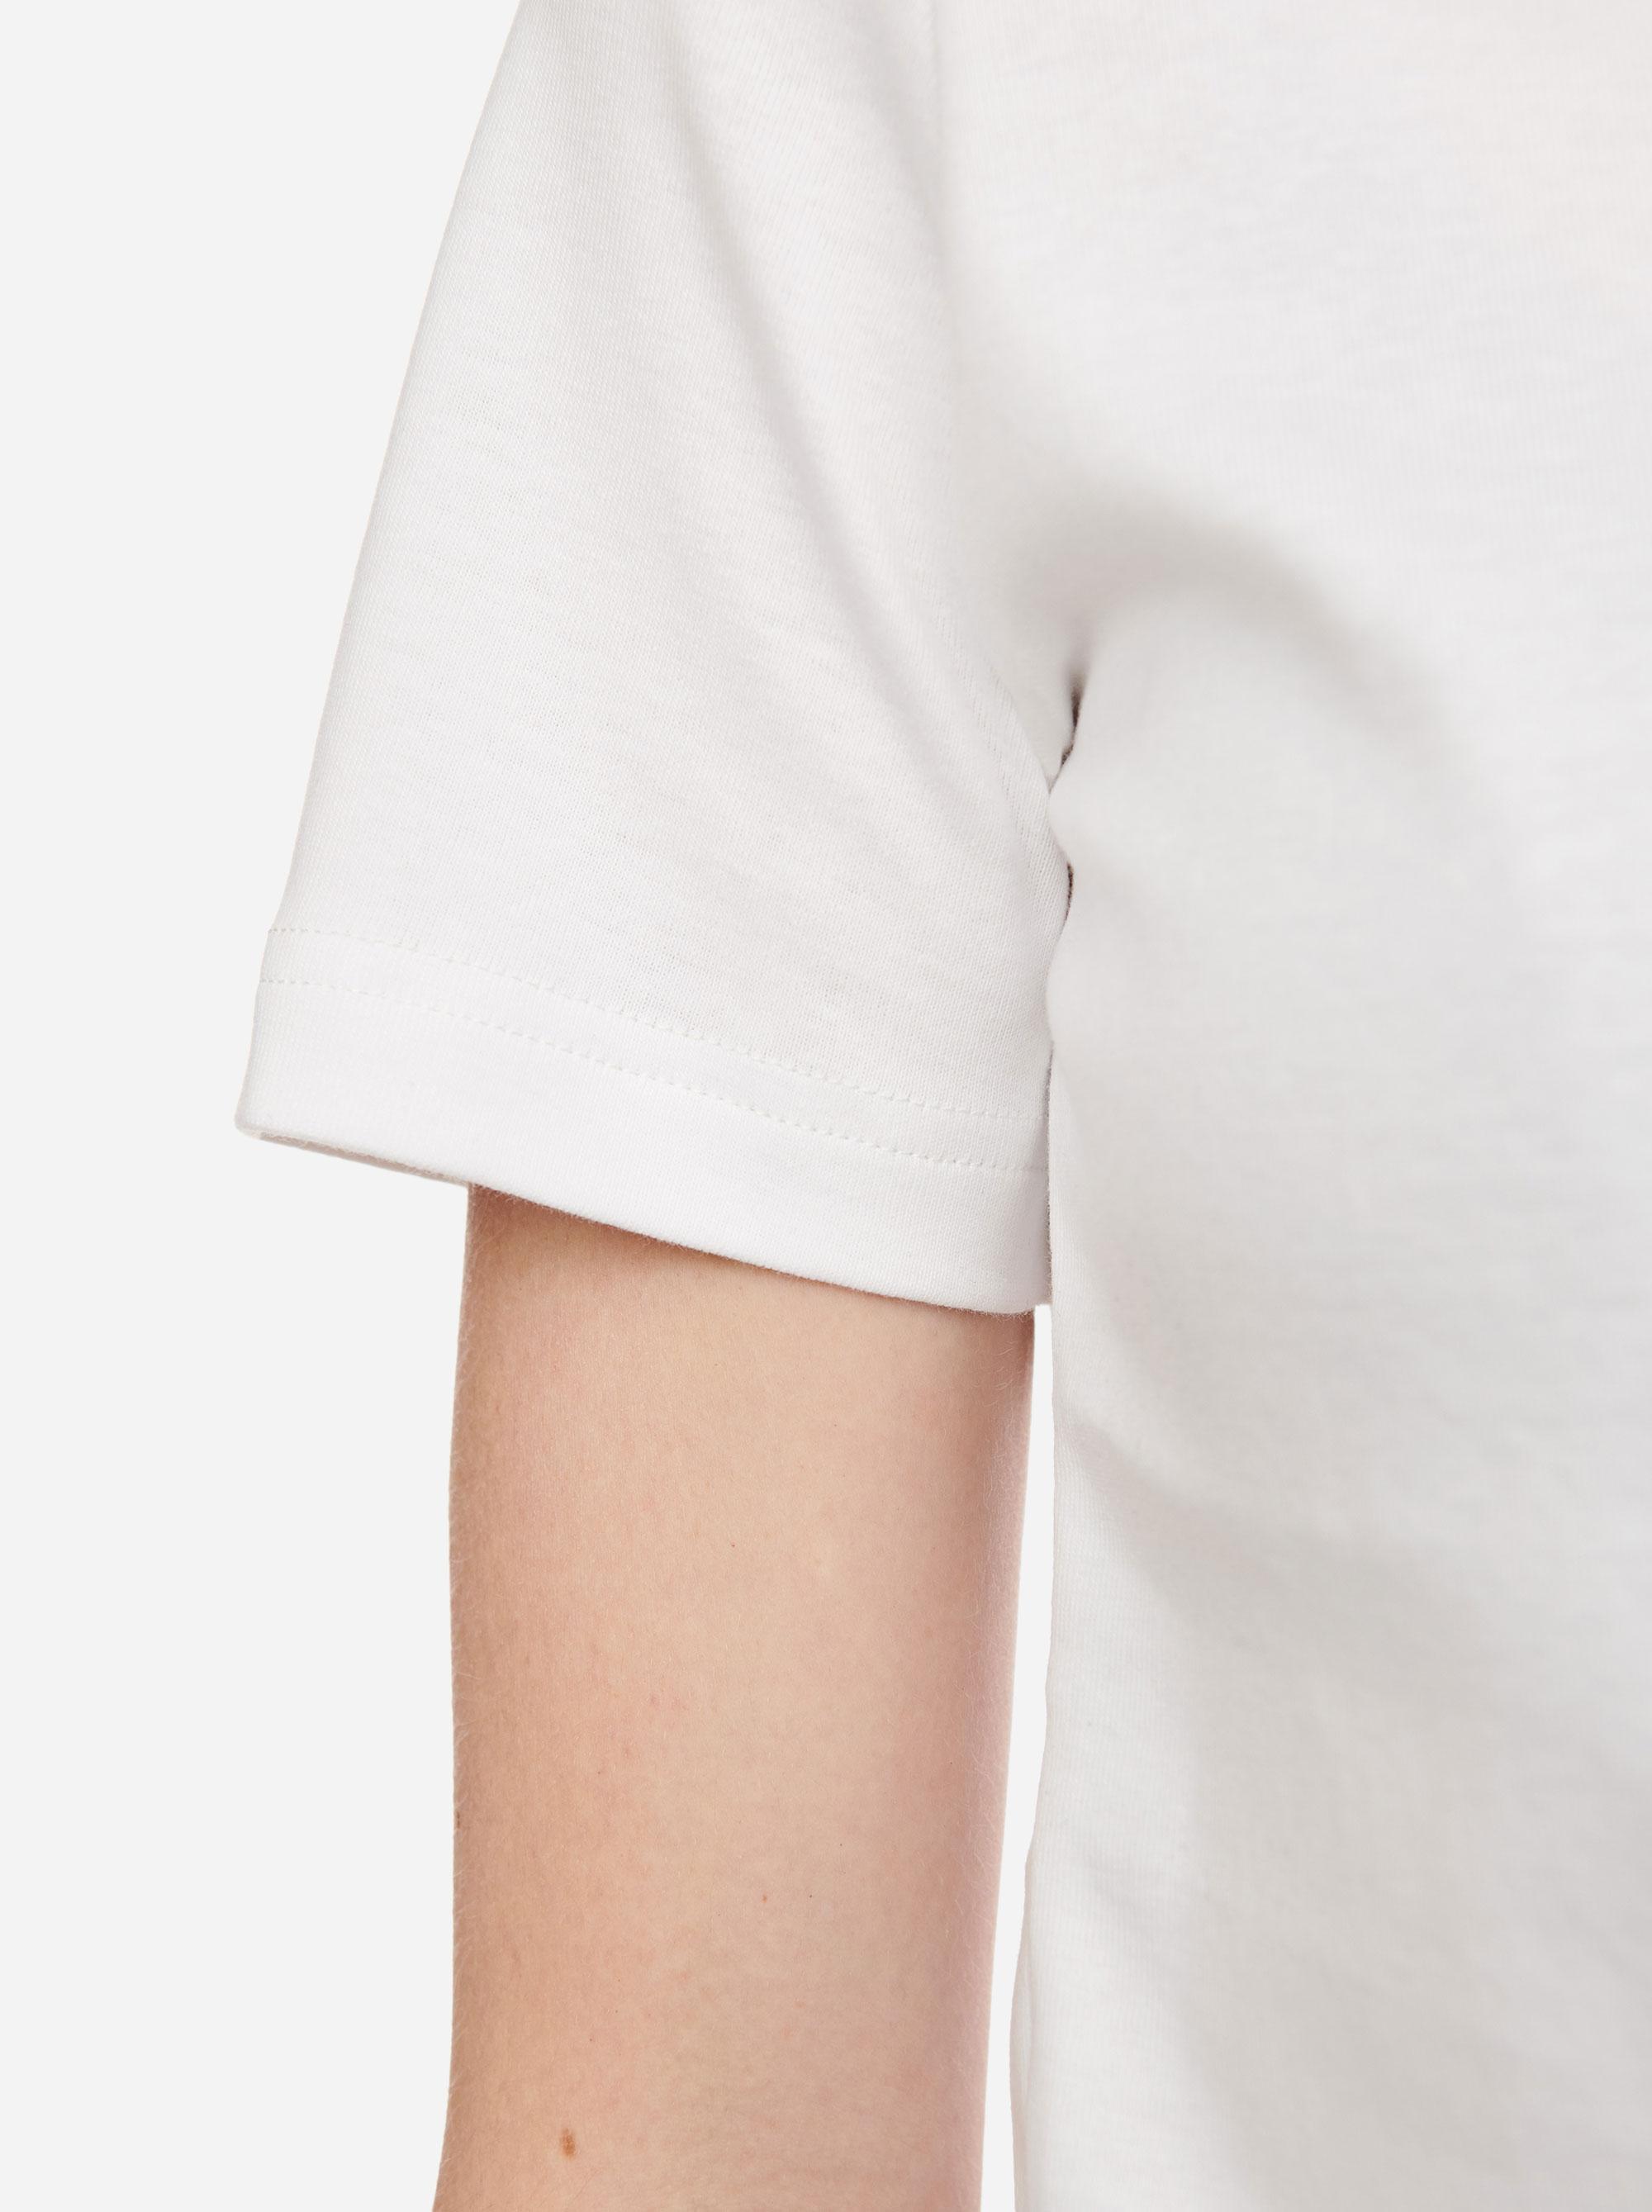 Teym - The T-Shirt - Women - White - 2